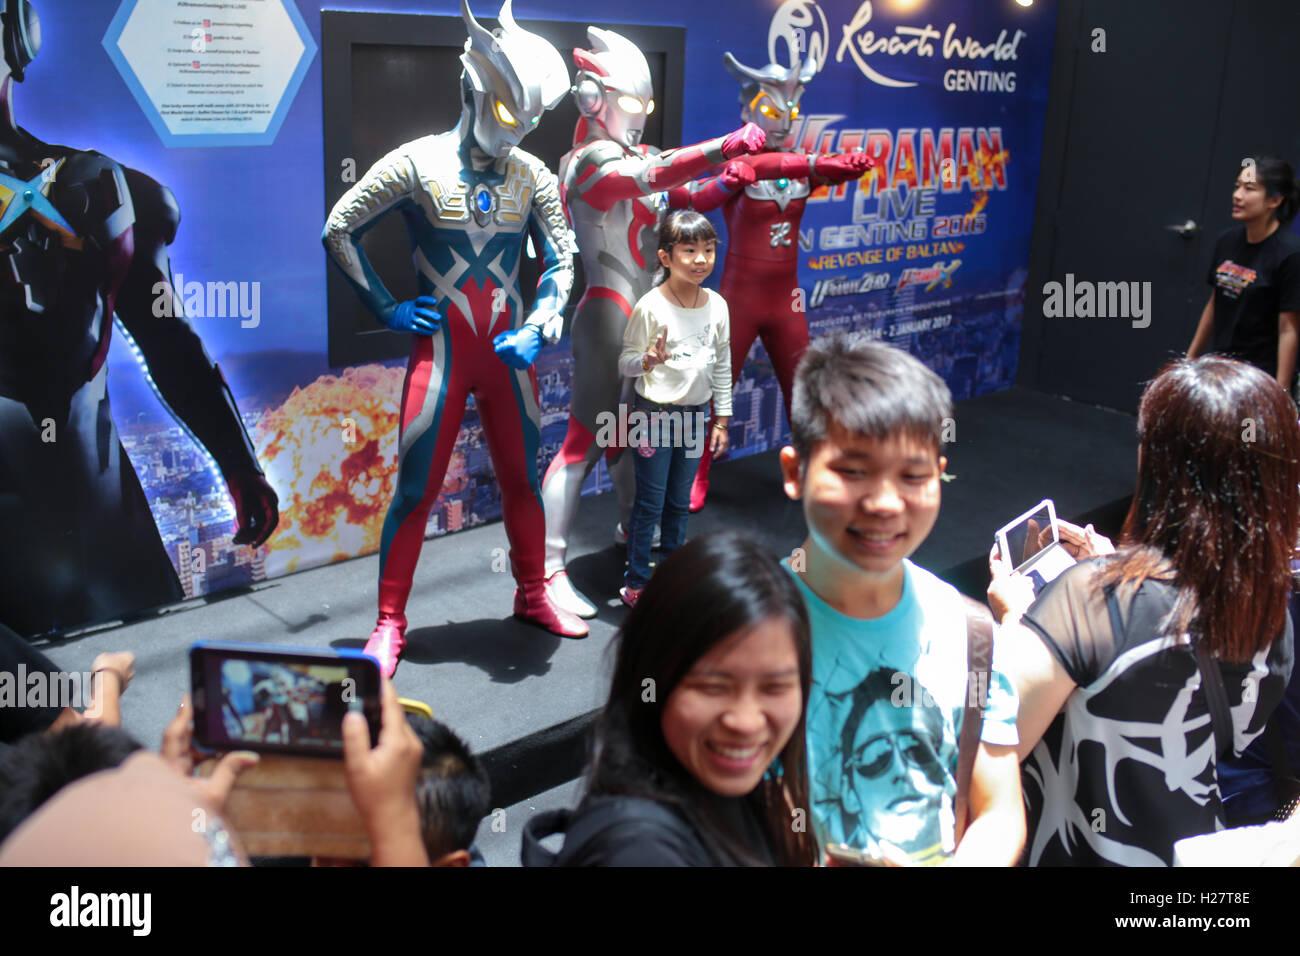 Family Taking Photos At Ultraman Meet And Greet Session At Toyko